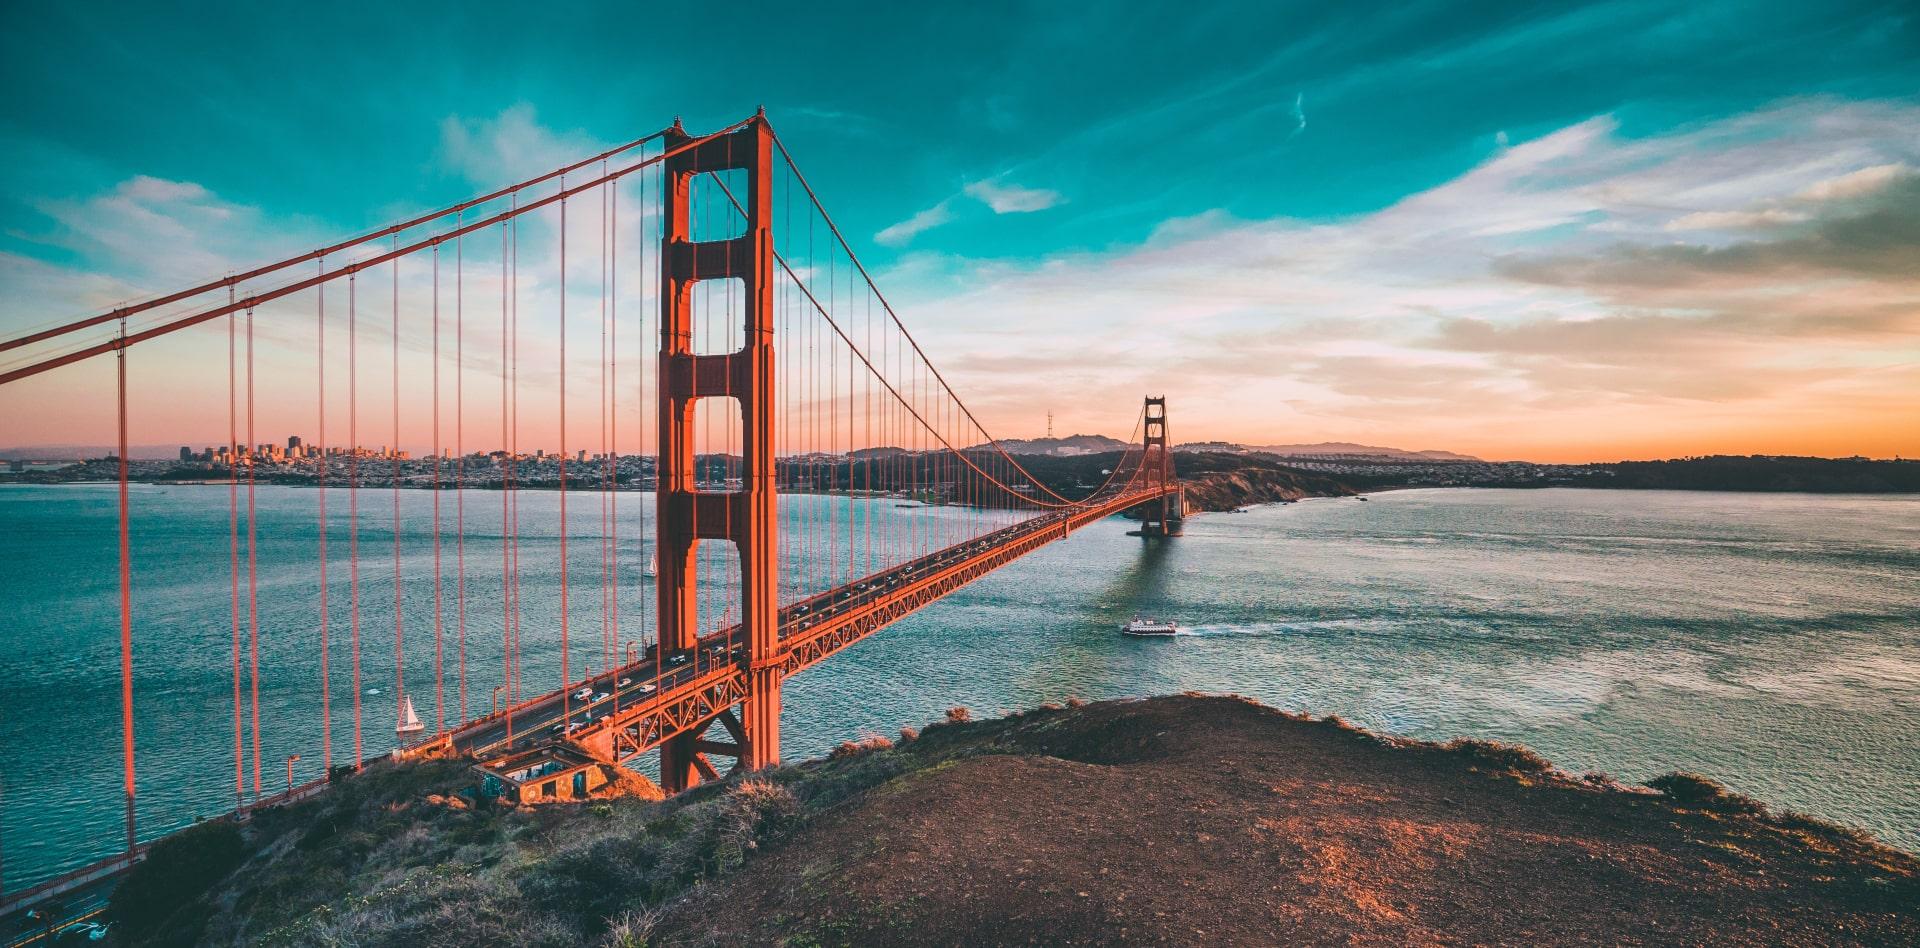 San Francisco, United States